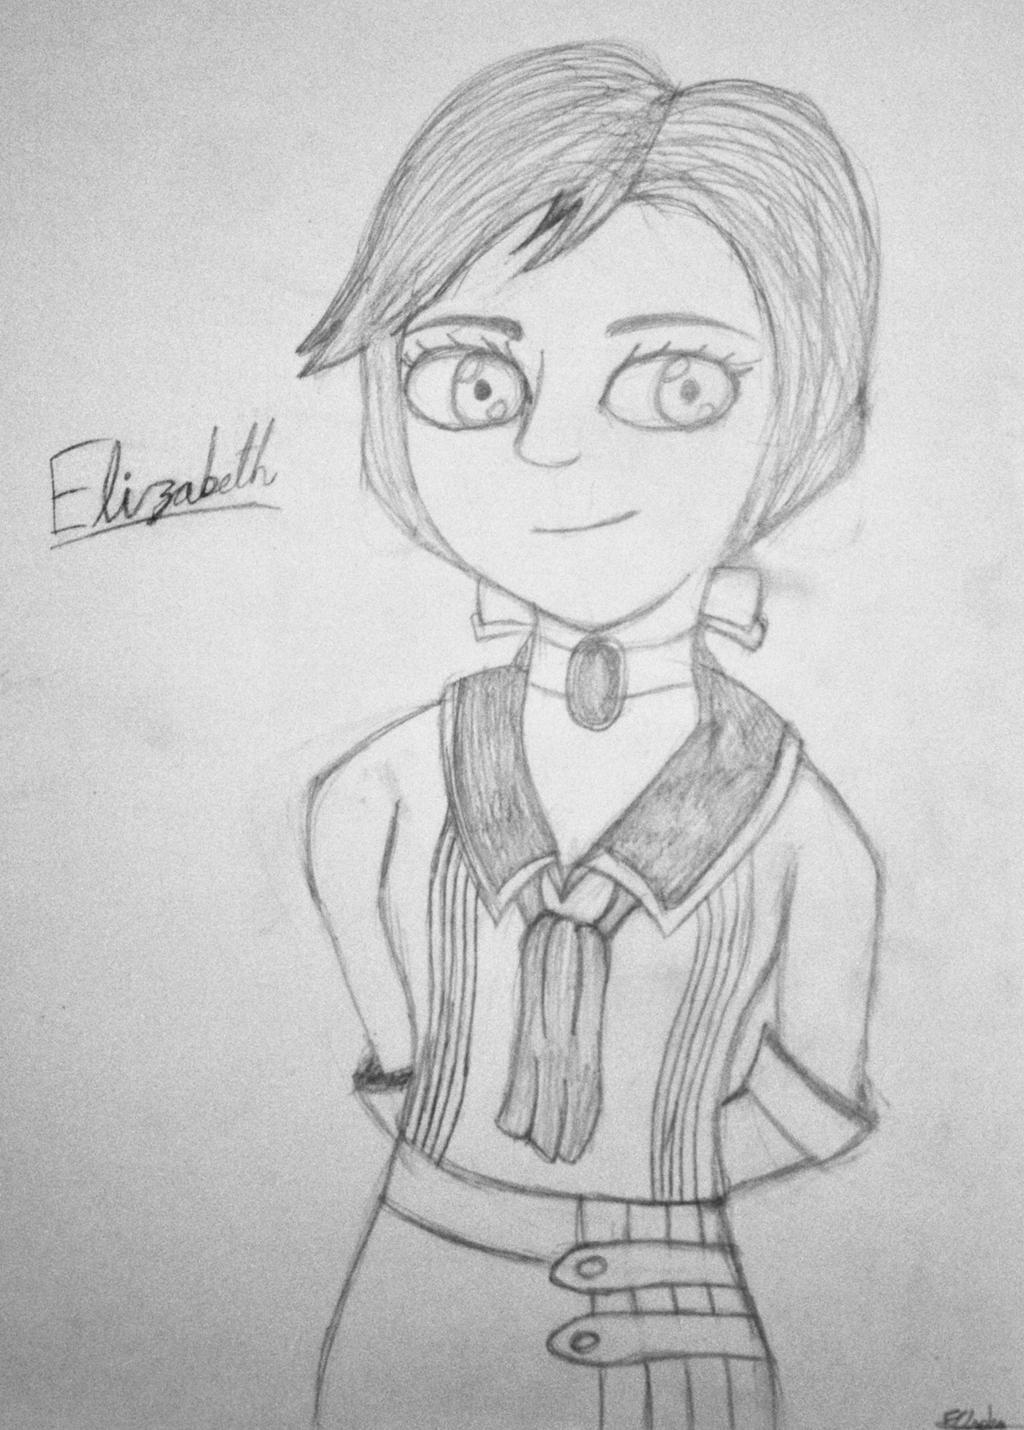 Bioshock Infinite - Elizabeth by SonicAngel23